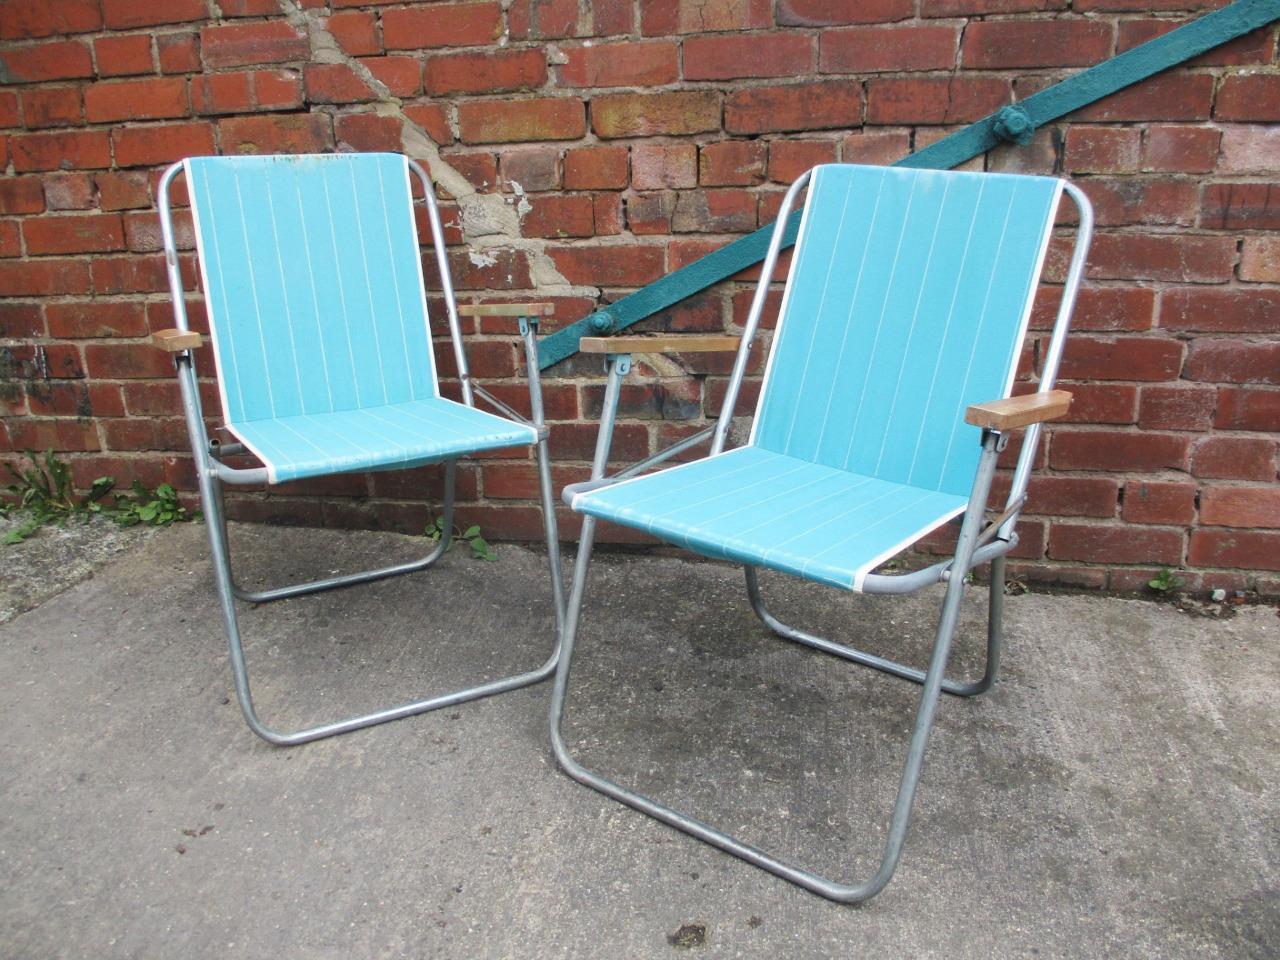 Pair Vintage 60s Blue Striped Folding Chairs Beach Camping Garden Festival Retro Vinterior